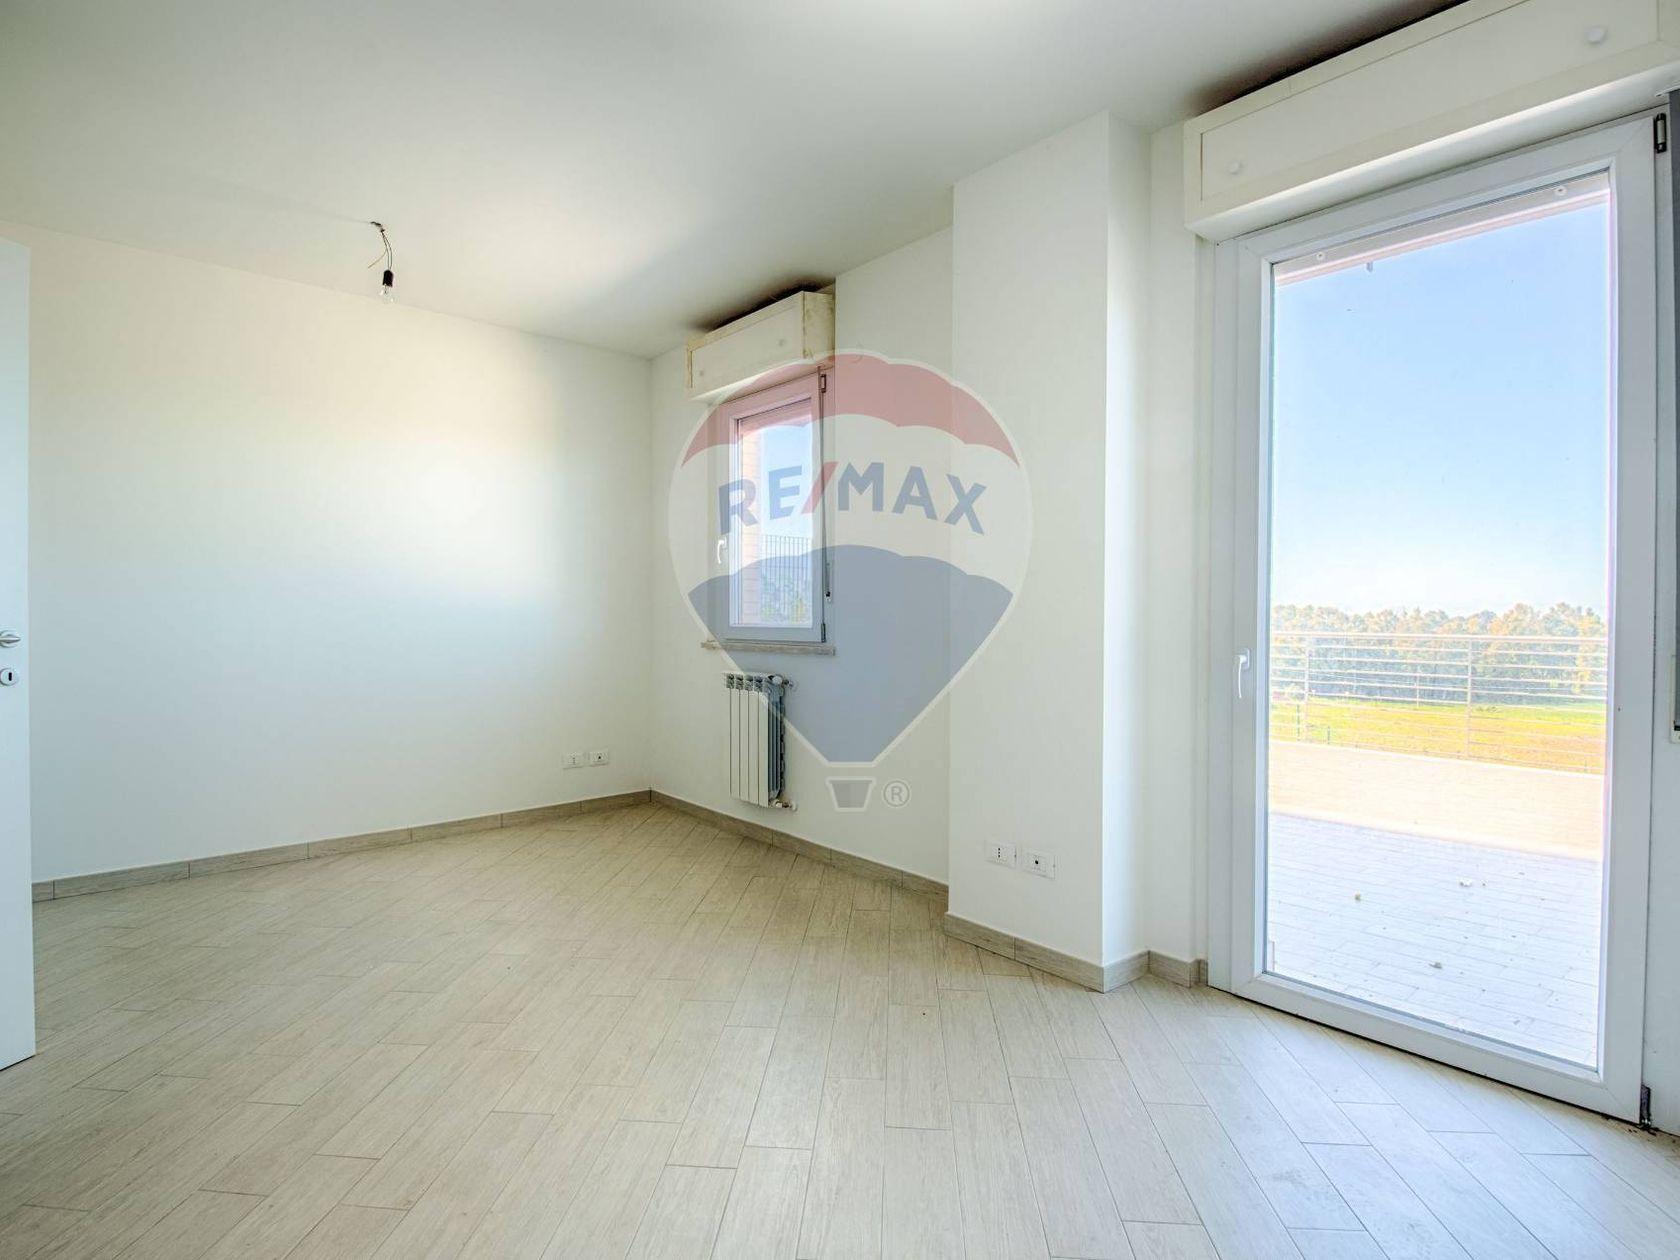 Appartamento Ara Nova, Fiumicino, RM Vendita - Foto 14